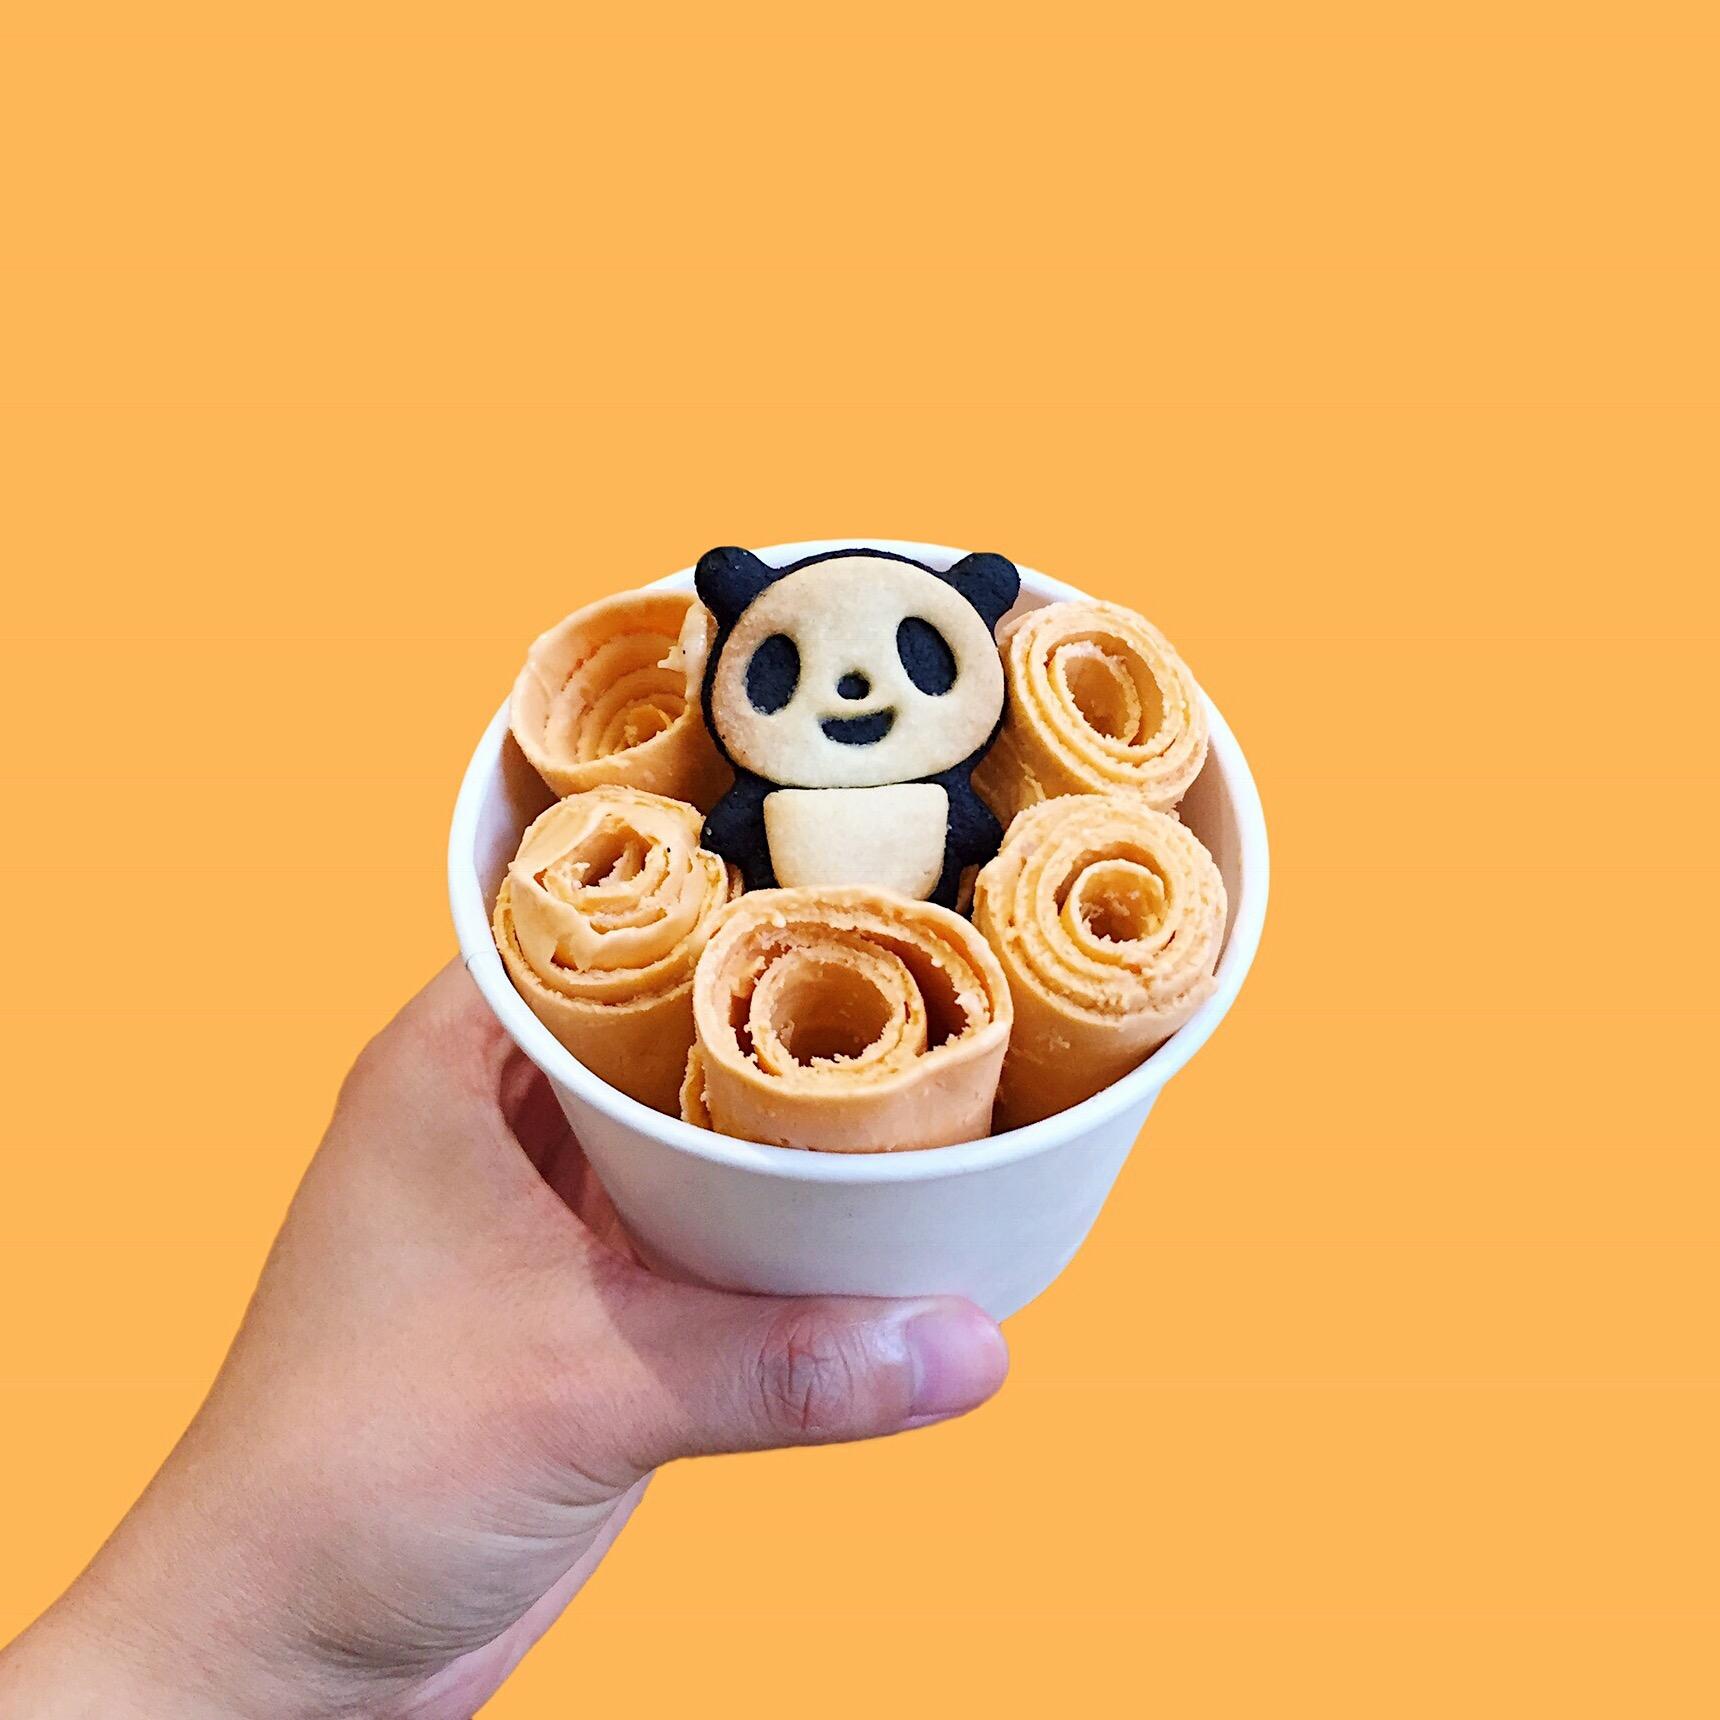 amy_chen_design_chinatown_nyc_food_guide_frozen_sweet_ice_cream_rolls.jpg